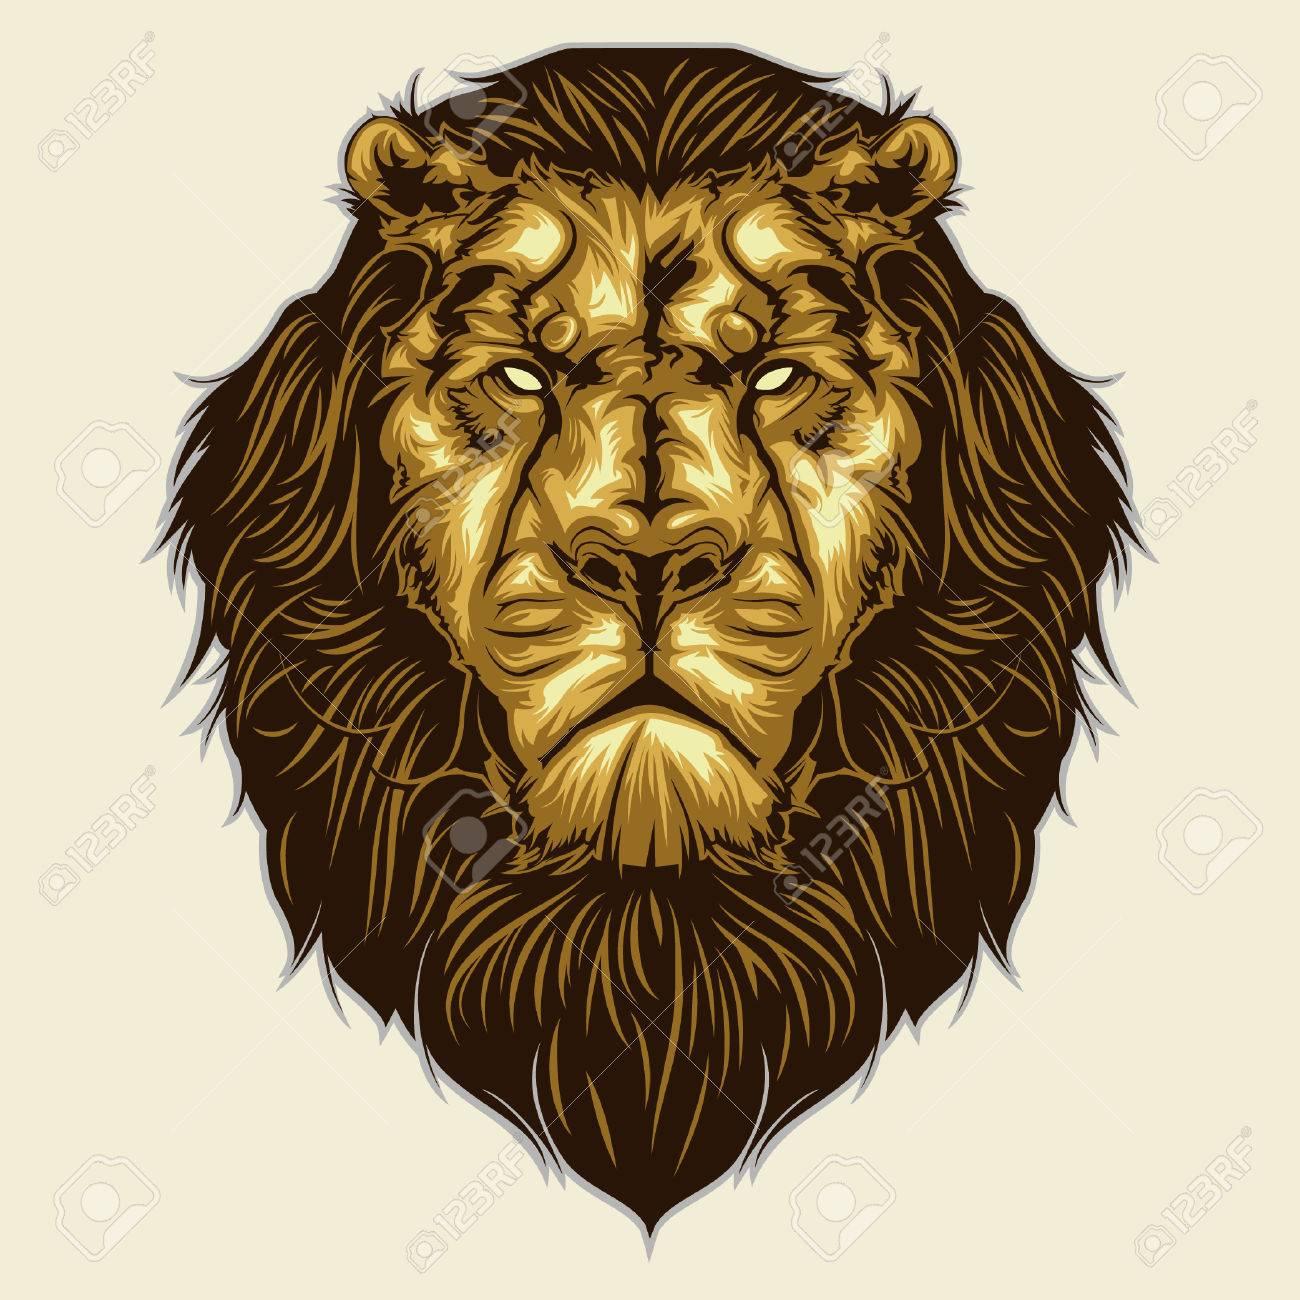 lion head mascot - 44826610